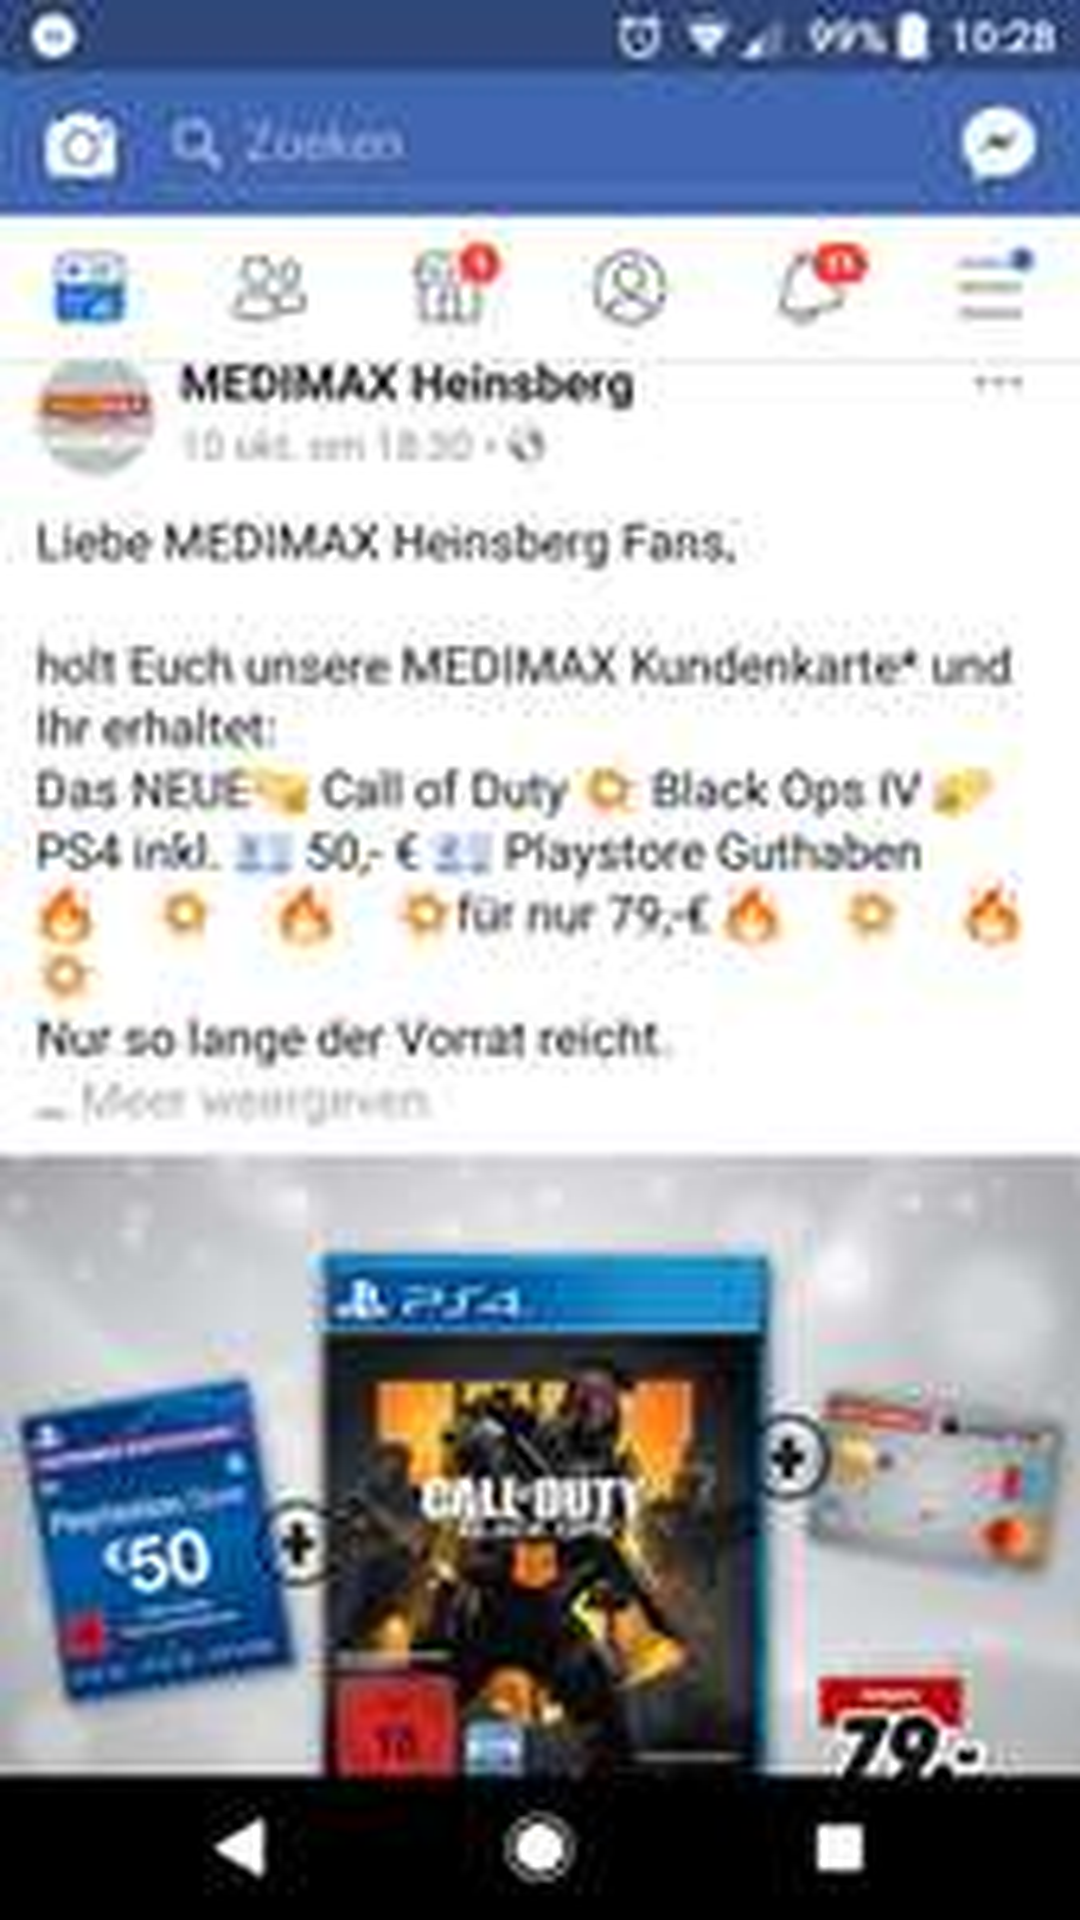 [Grensdeal] Black Ops 4 PS4 + €50 Playstation tegoed @ Medimax Heinsberg